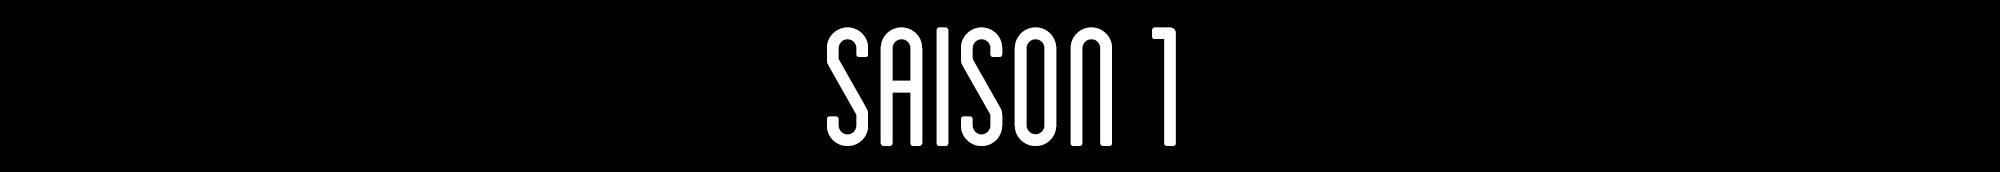 Web_SAISON_1.jpg